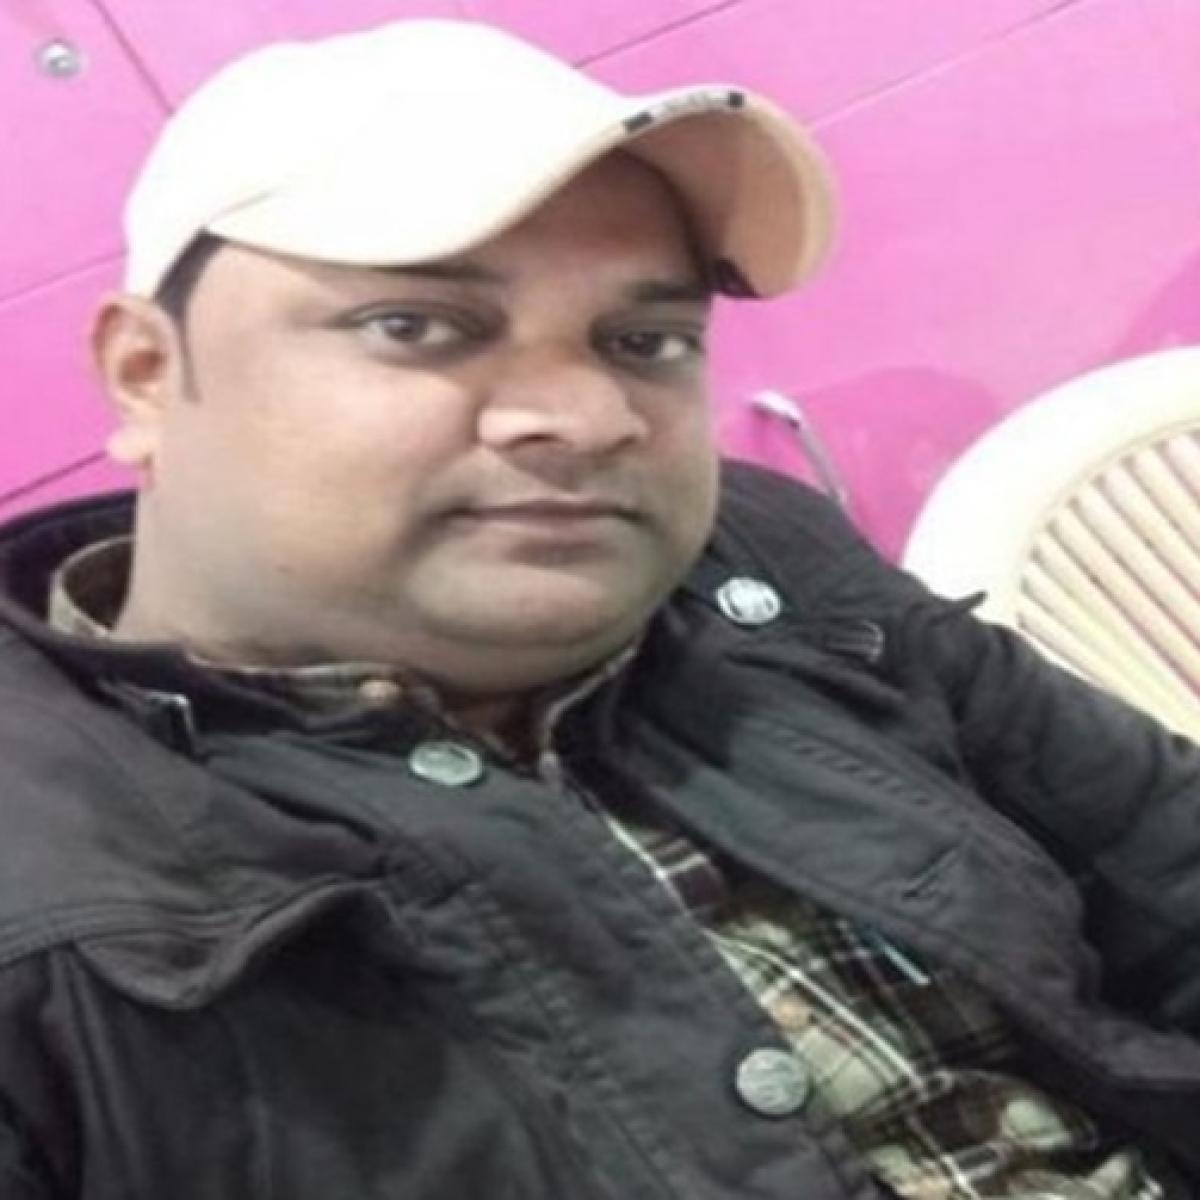 Ghaziabad journalist killing: Vijay Nagar police station's SHO suspended for negligence, case transferred